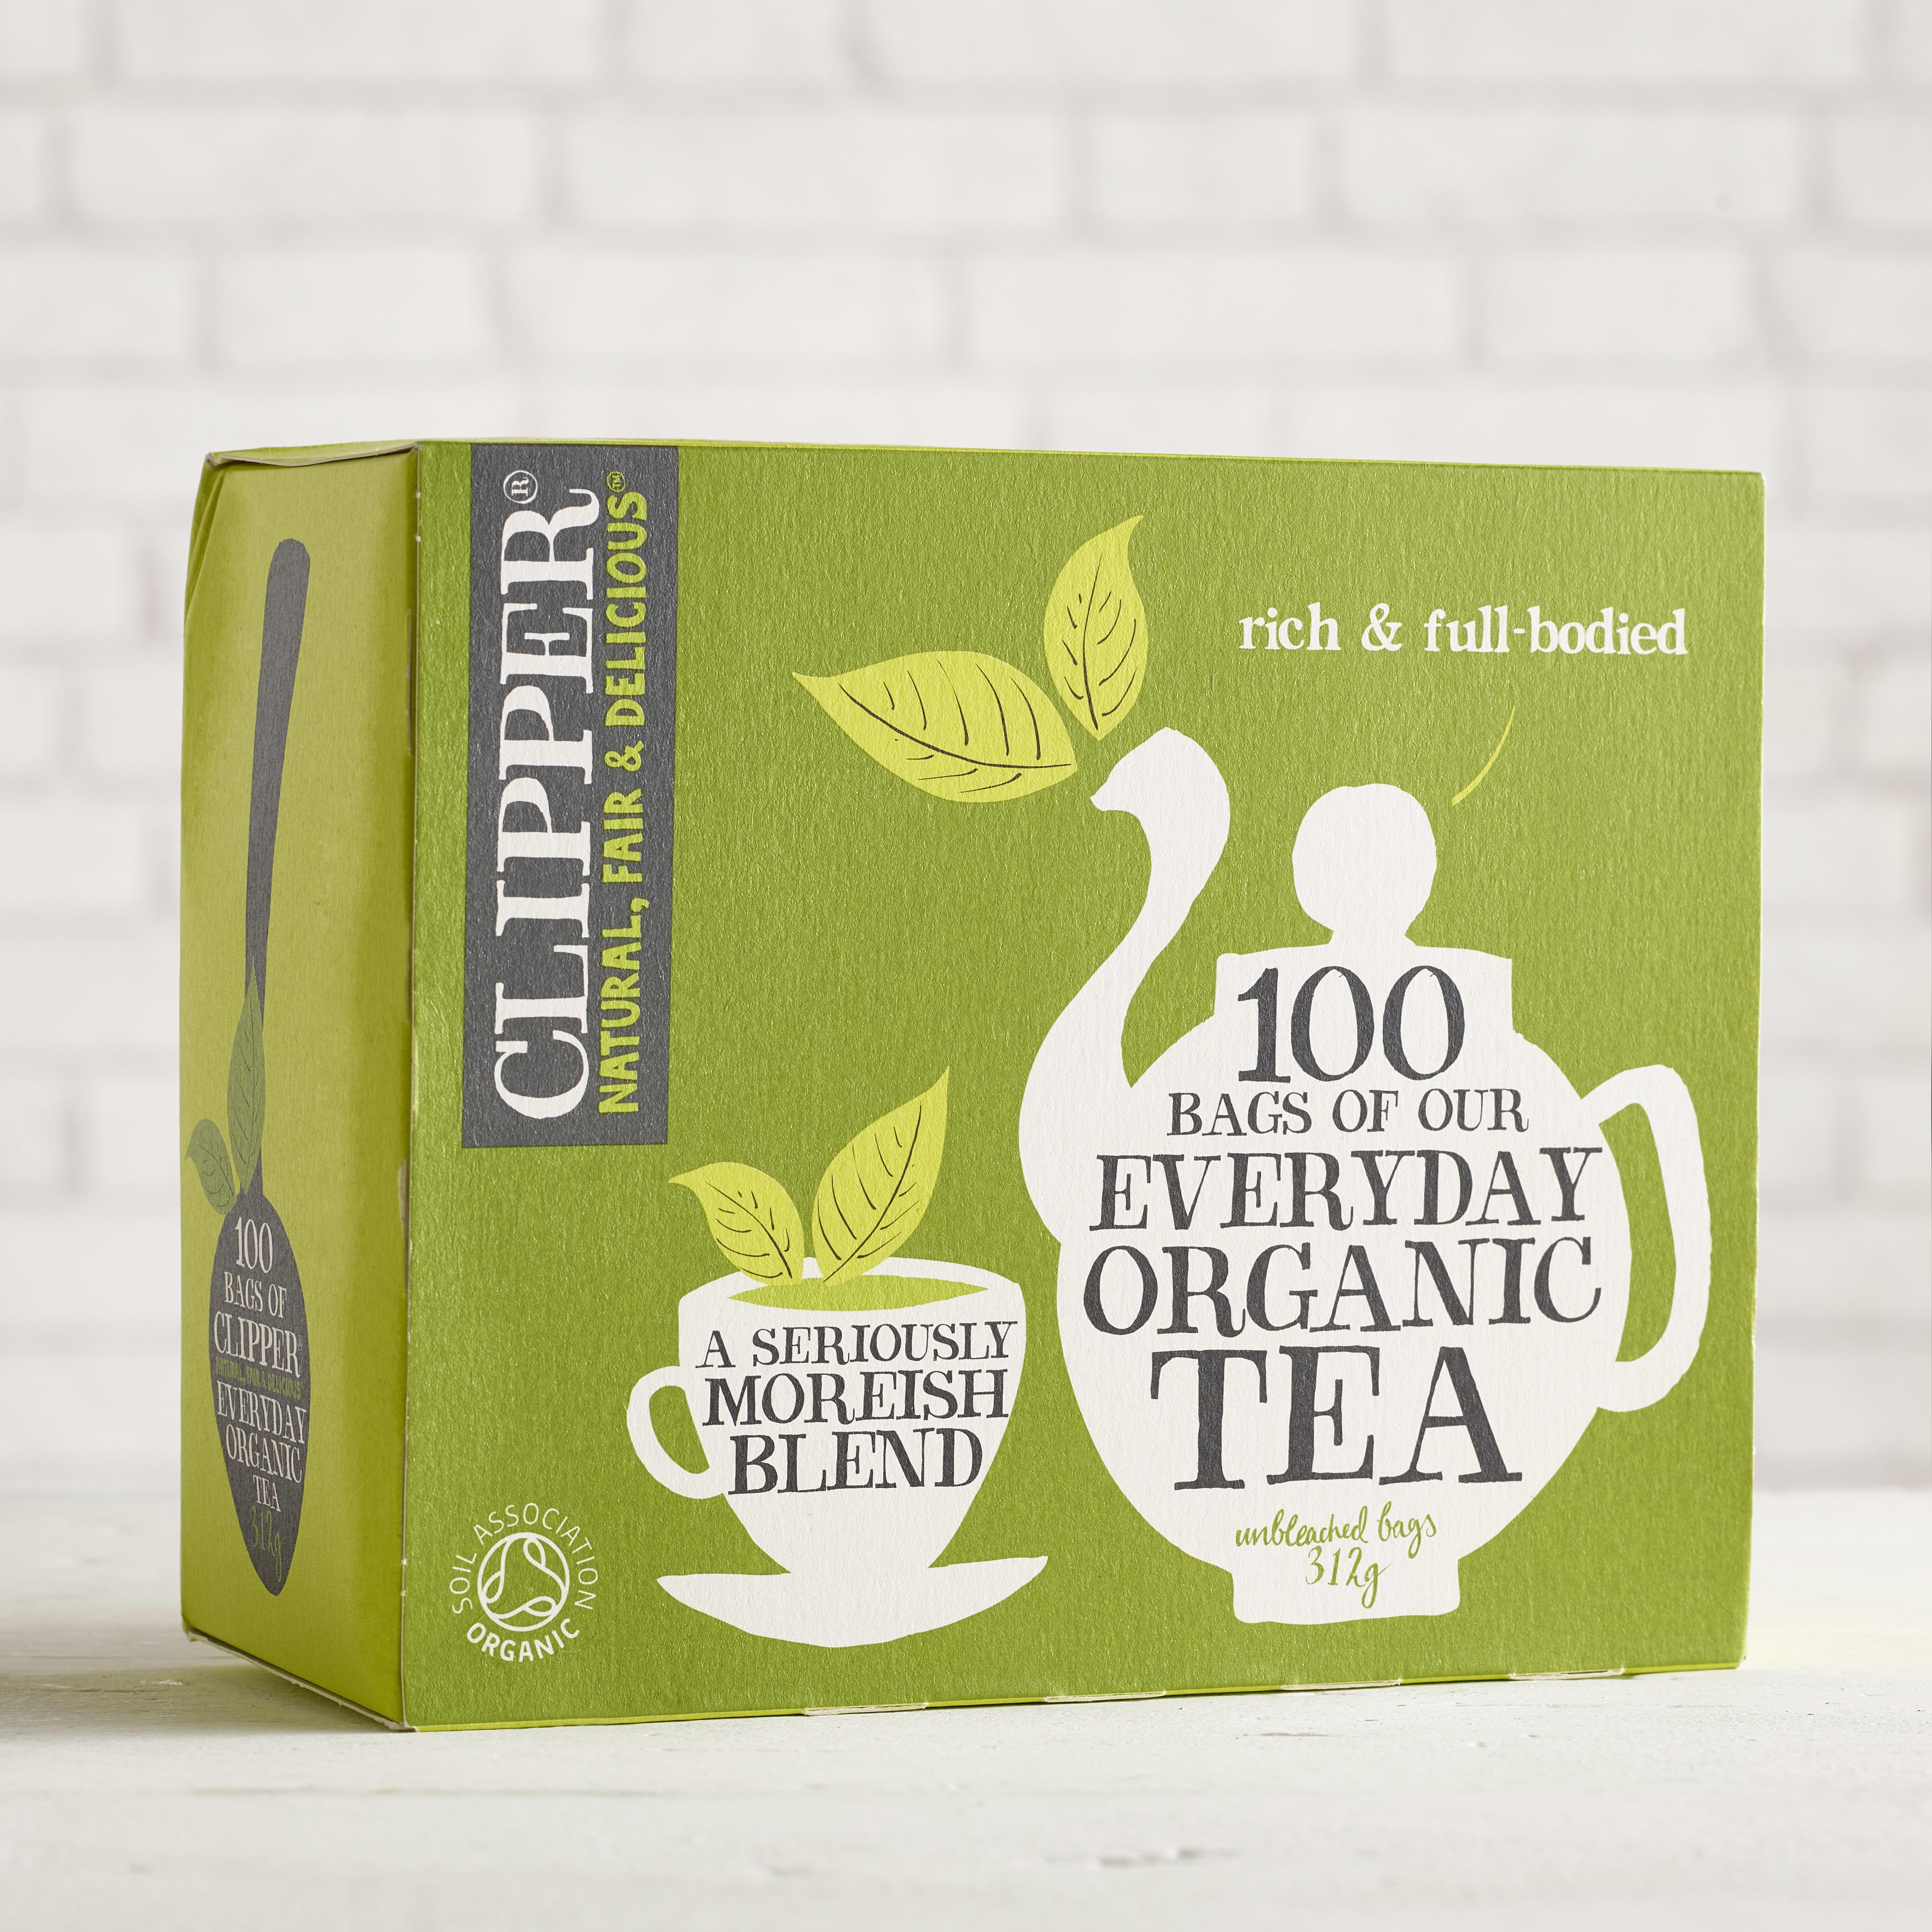 Clipper Organic Everyday Tea, 100 bags